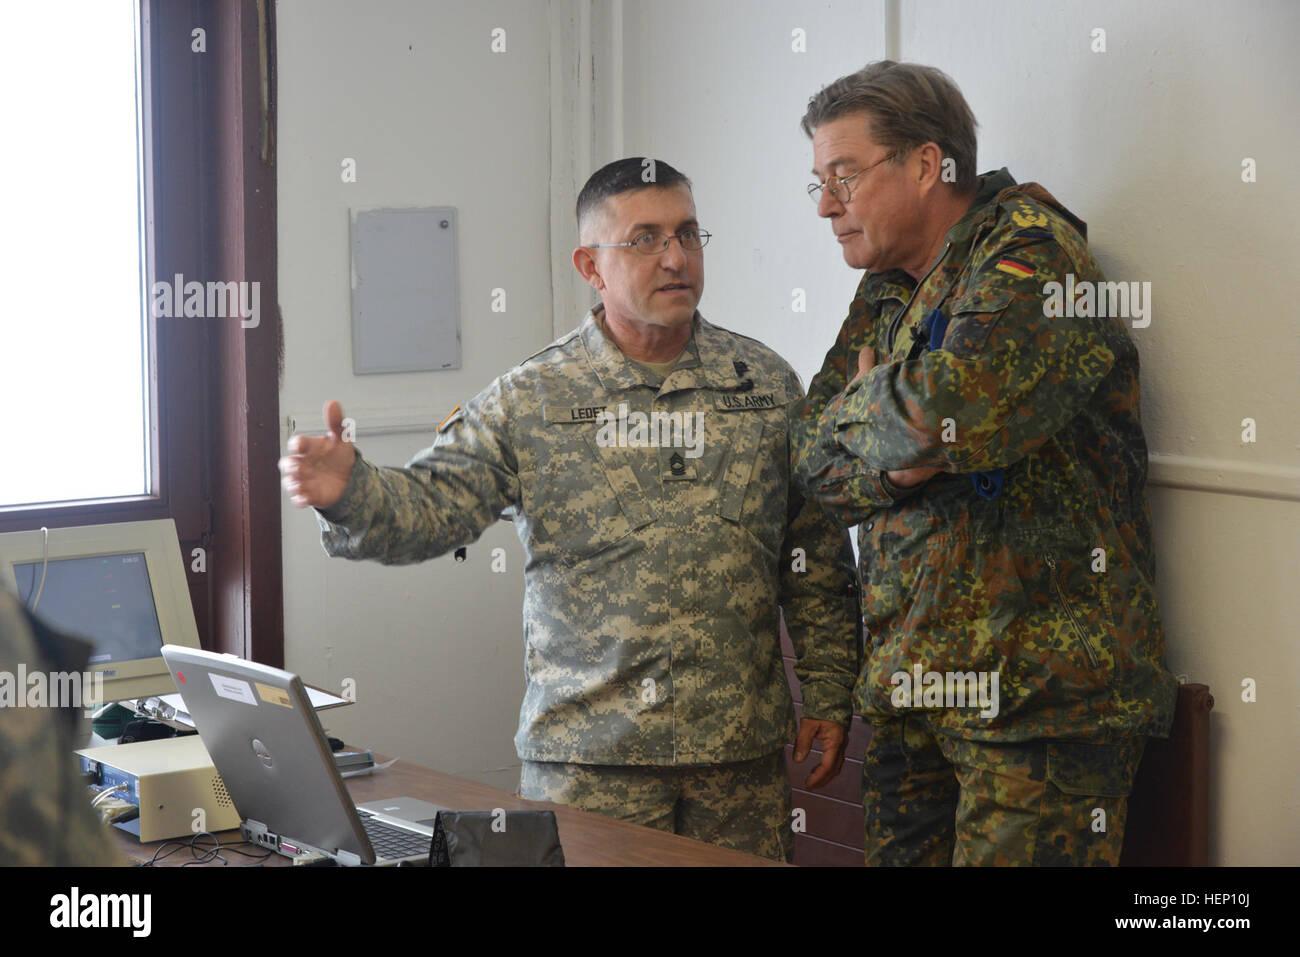 Generaloberstabsarzt Dr Med Ingo Patschke The German Army Surgeon Stock Photo Alamy